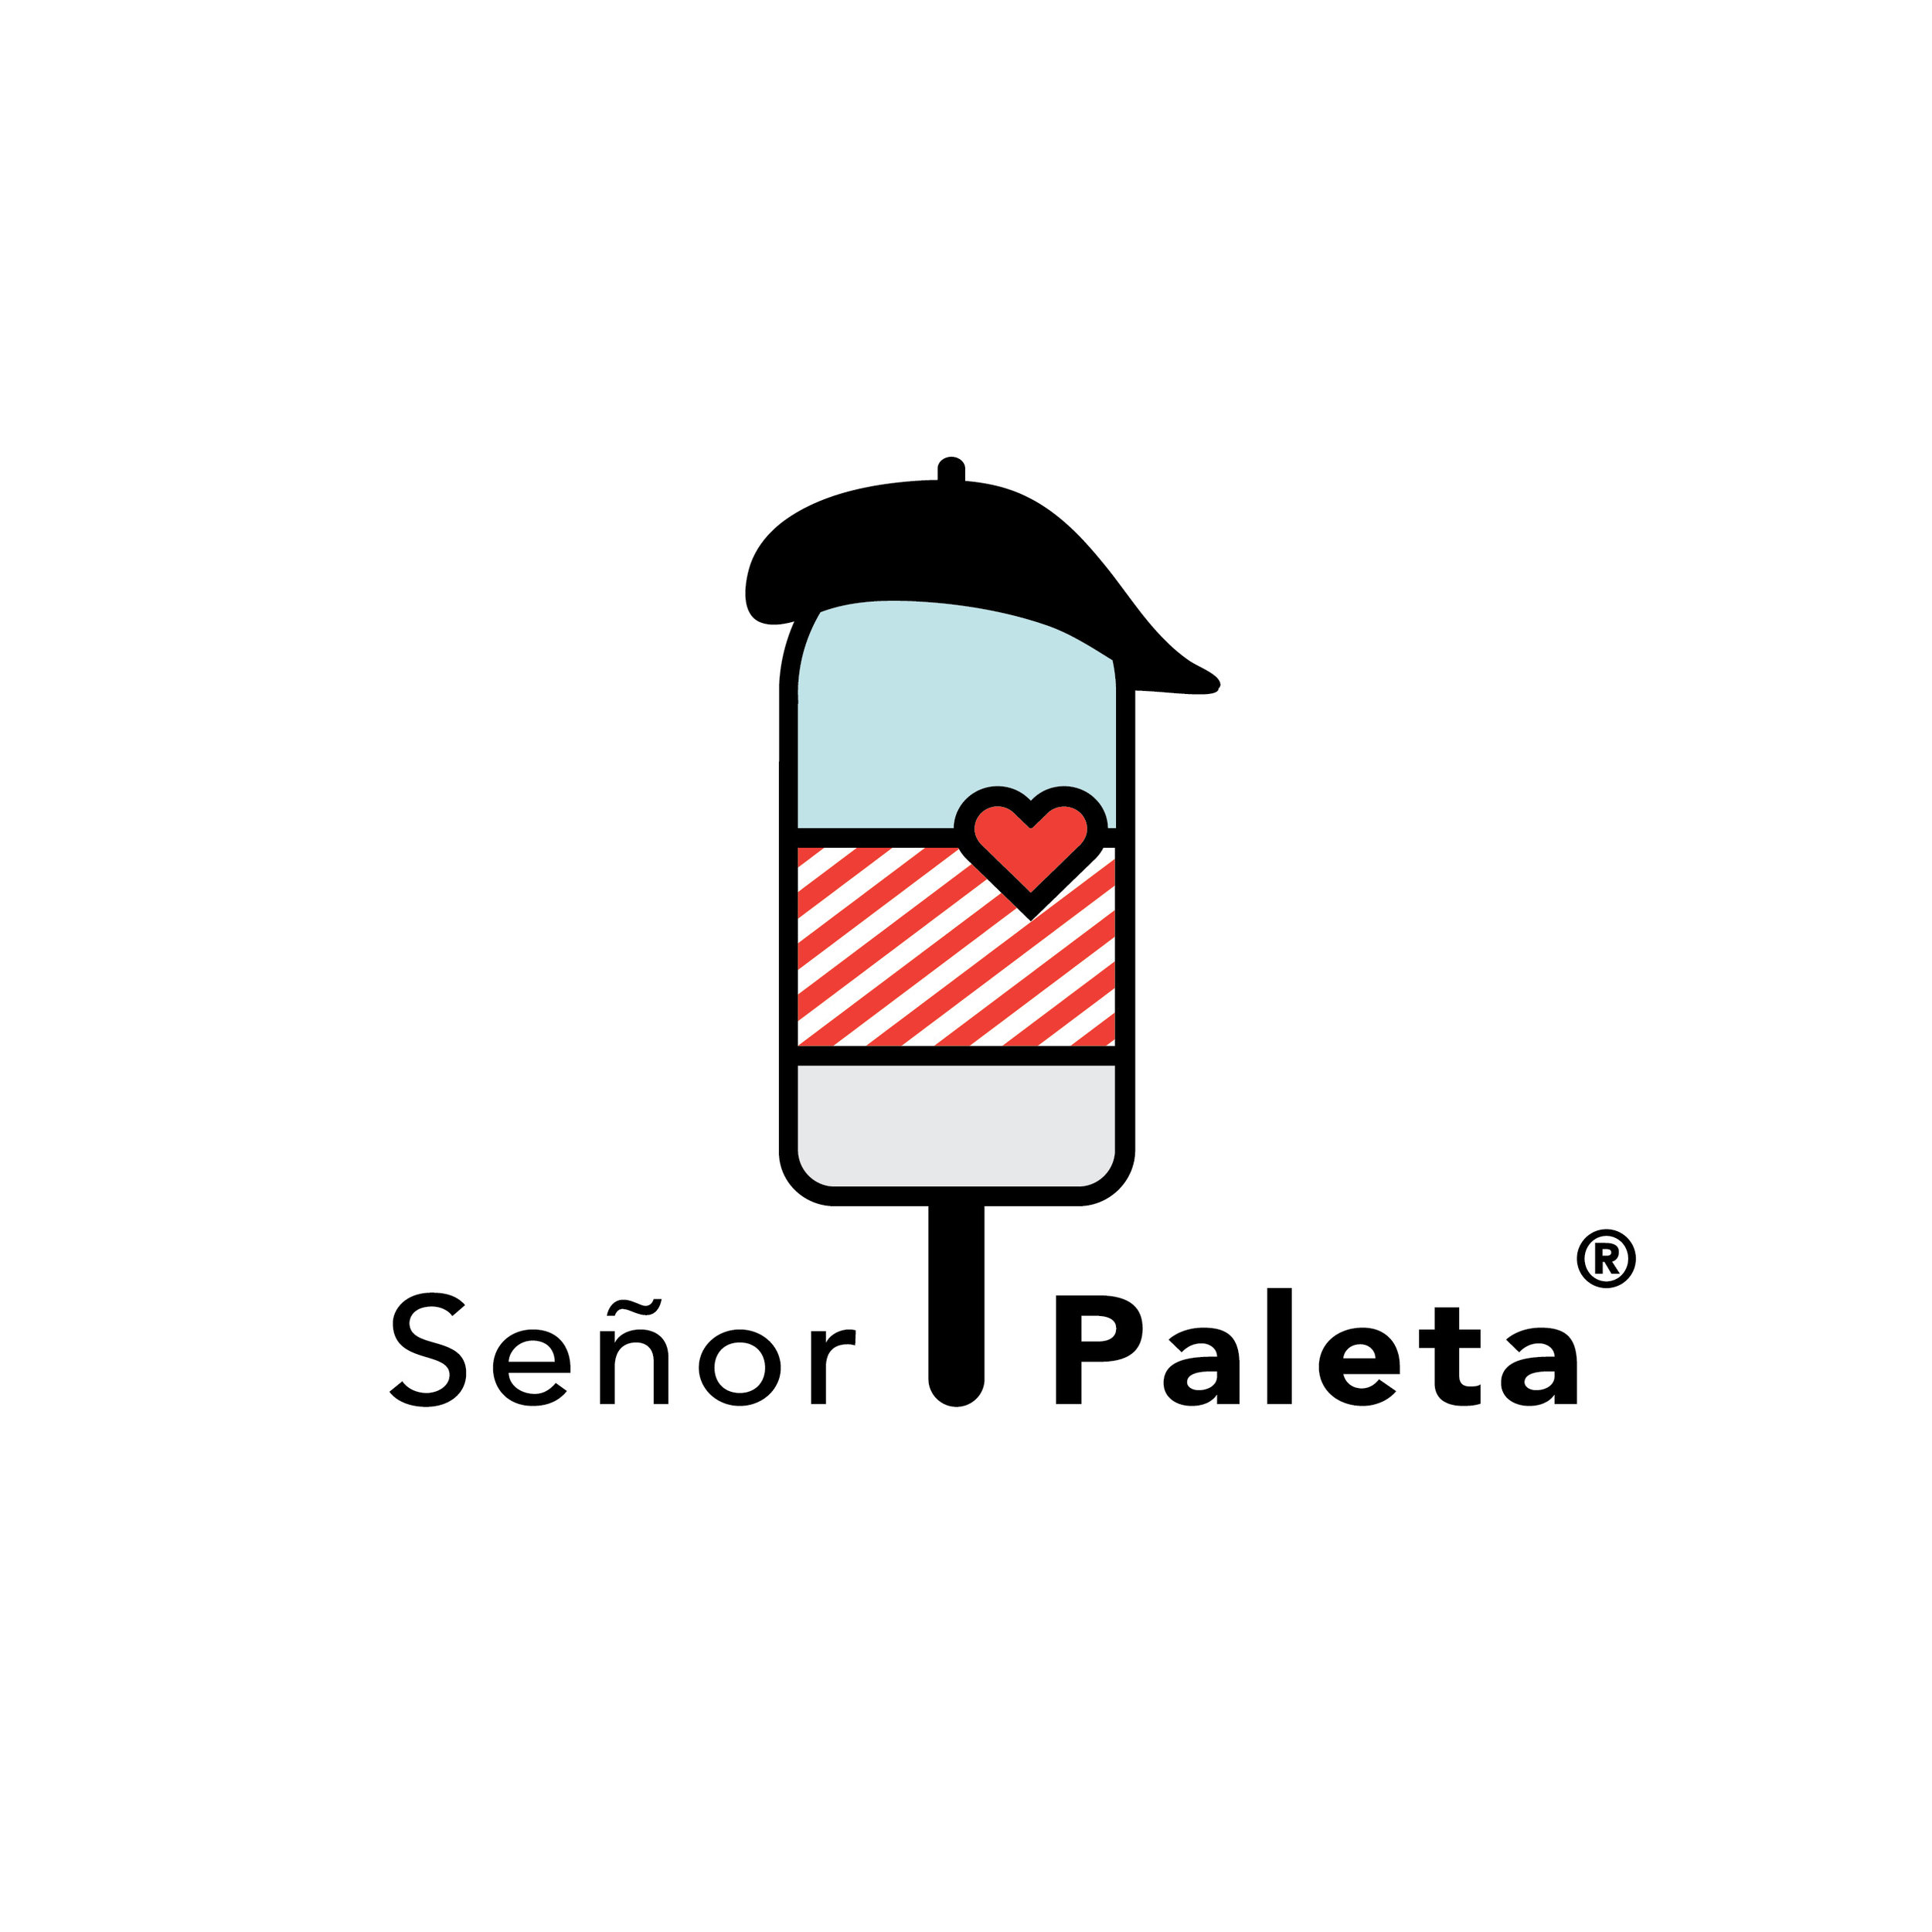 Señor Paleta